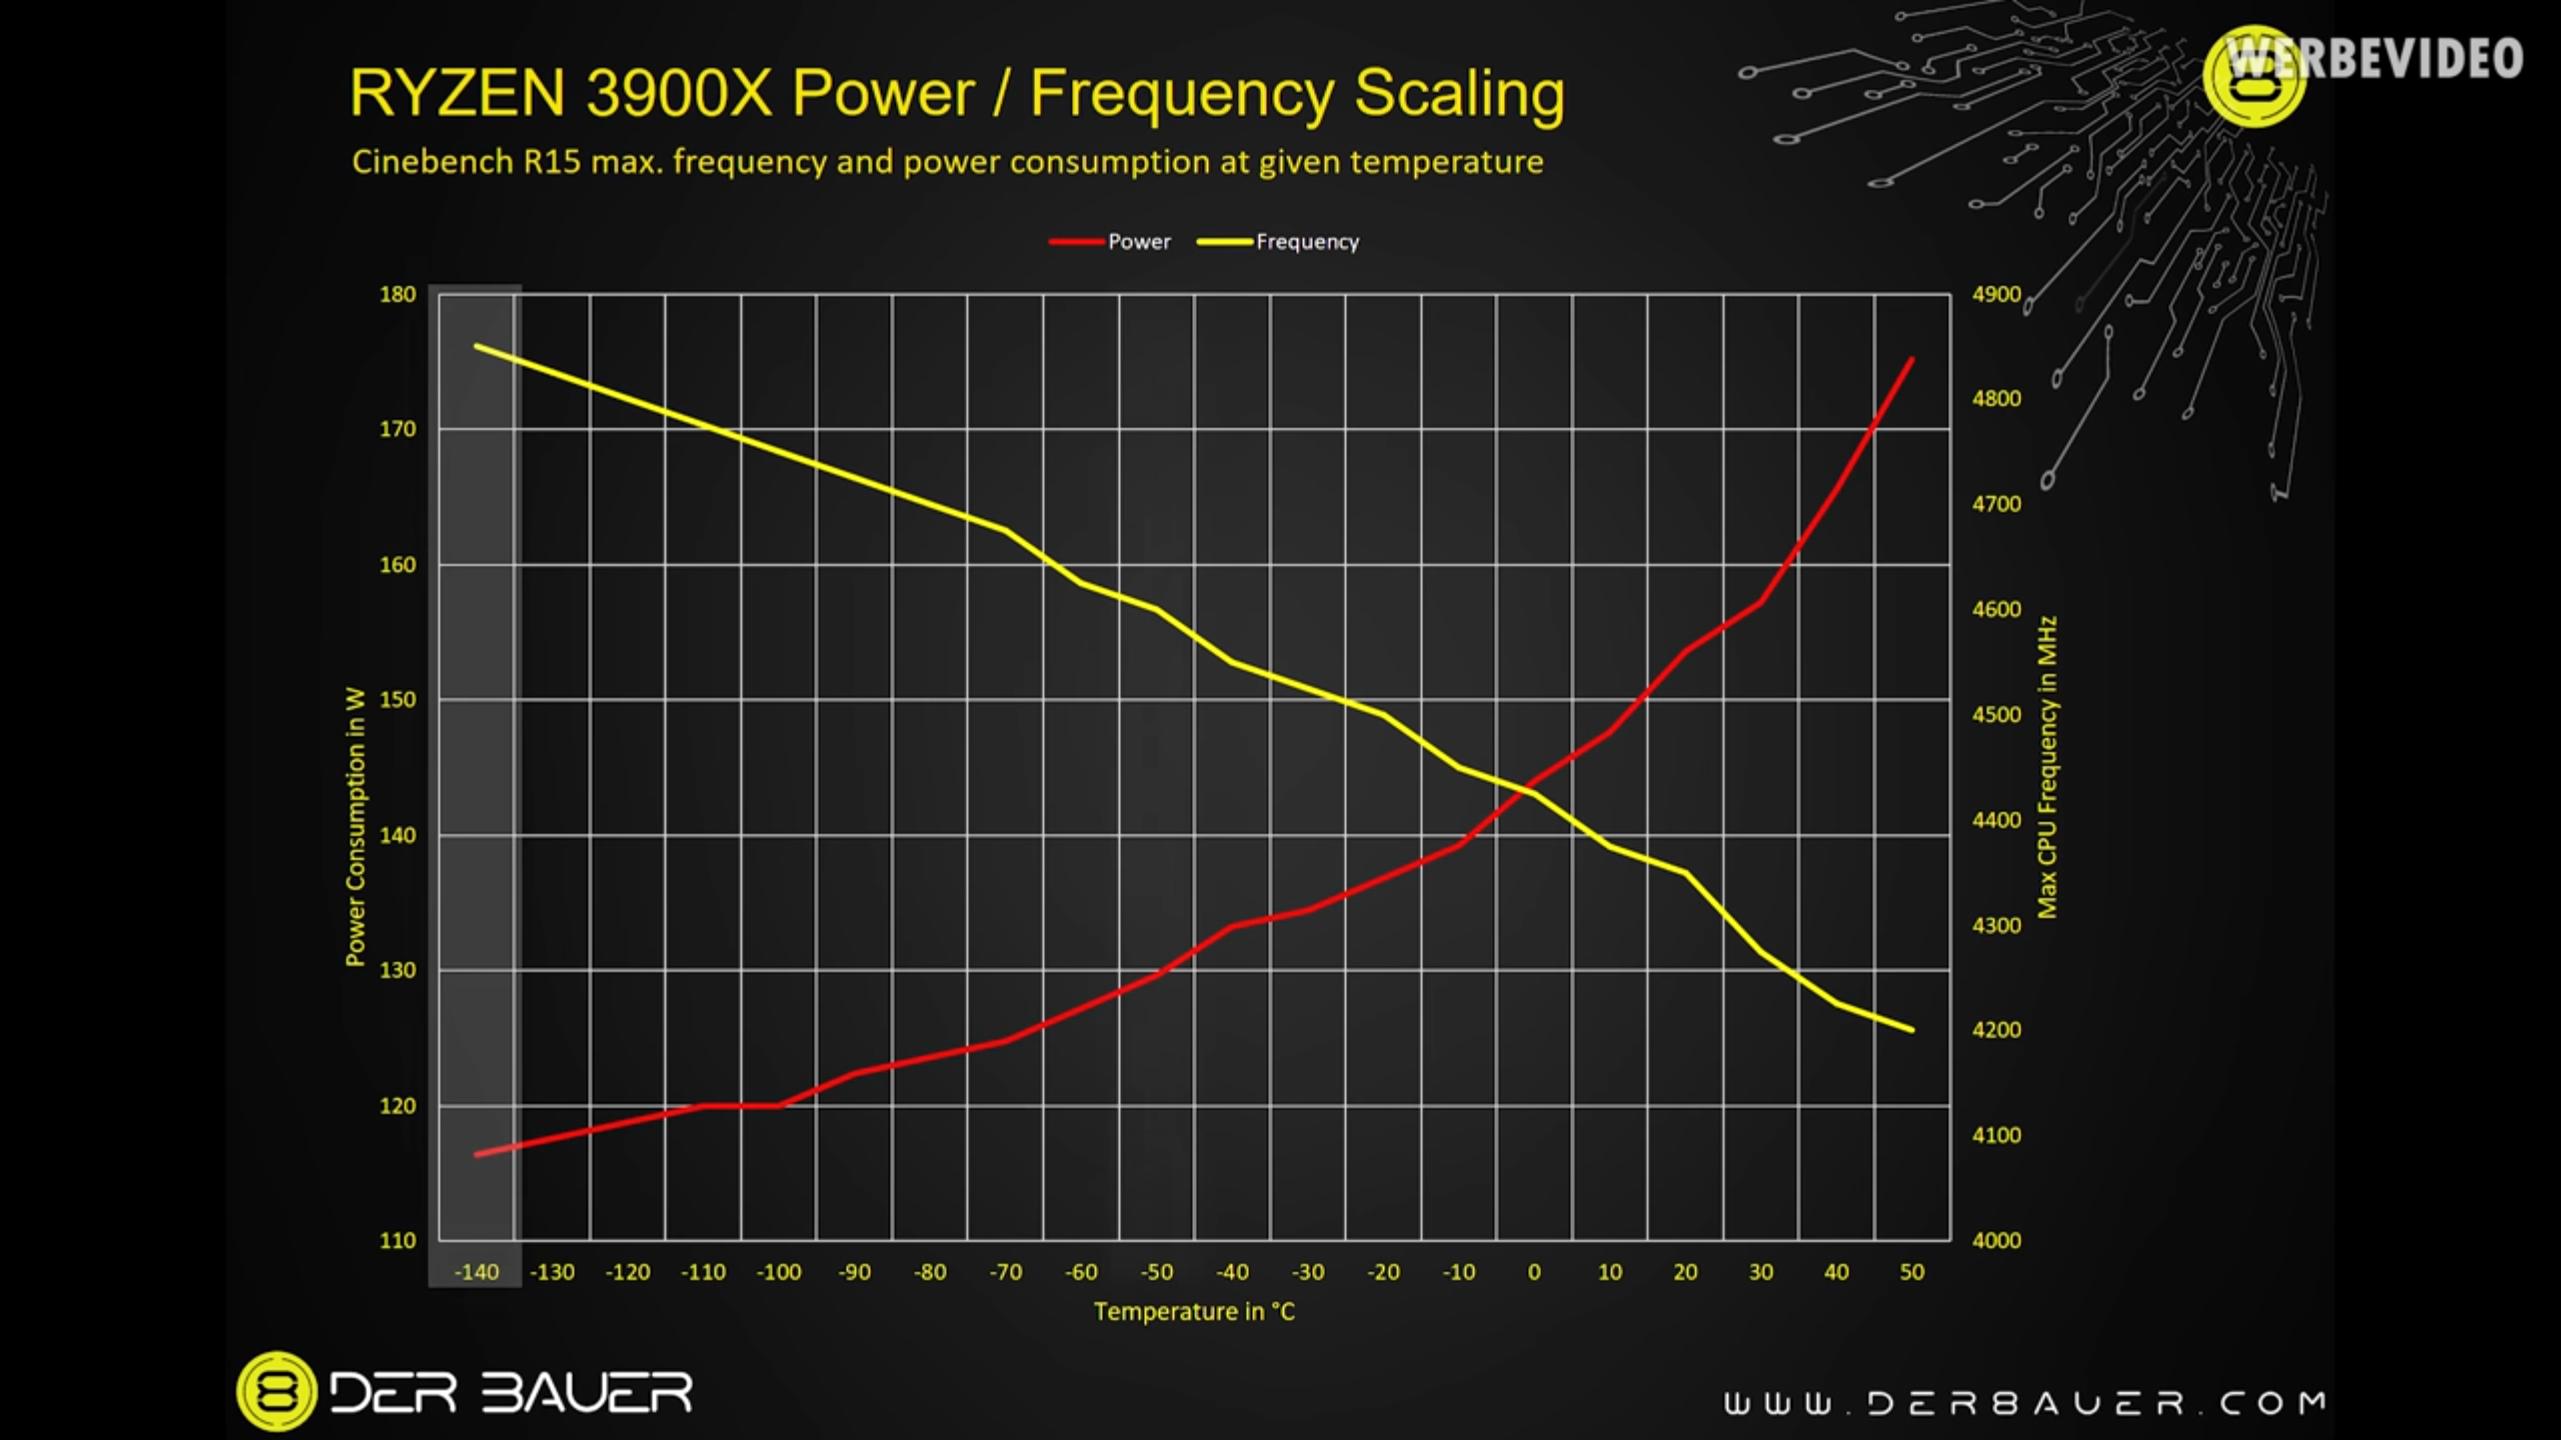 Did you get a shiny new Ryzen 3000 CPU? | TechPowerUp Forums